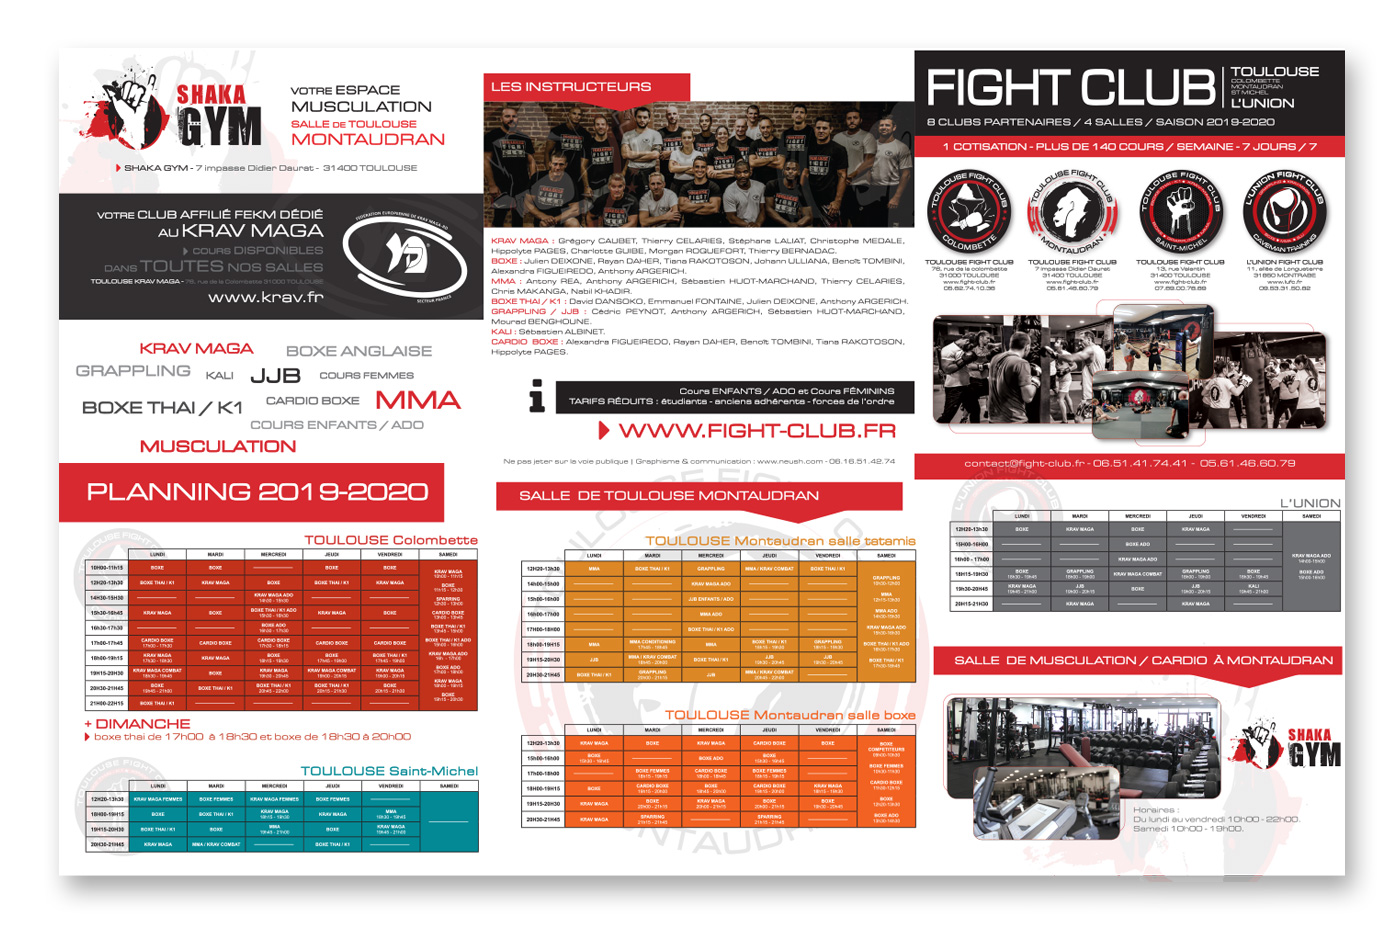 Flyer-ToulouseFightClub